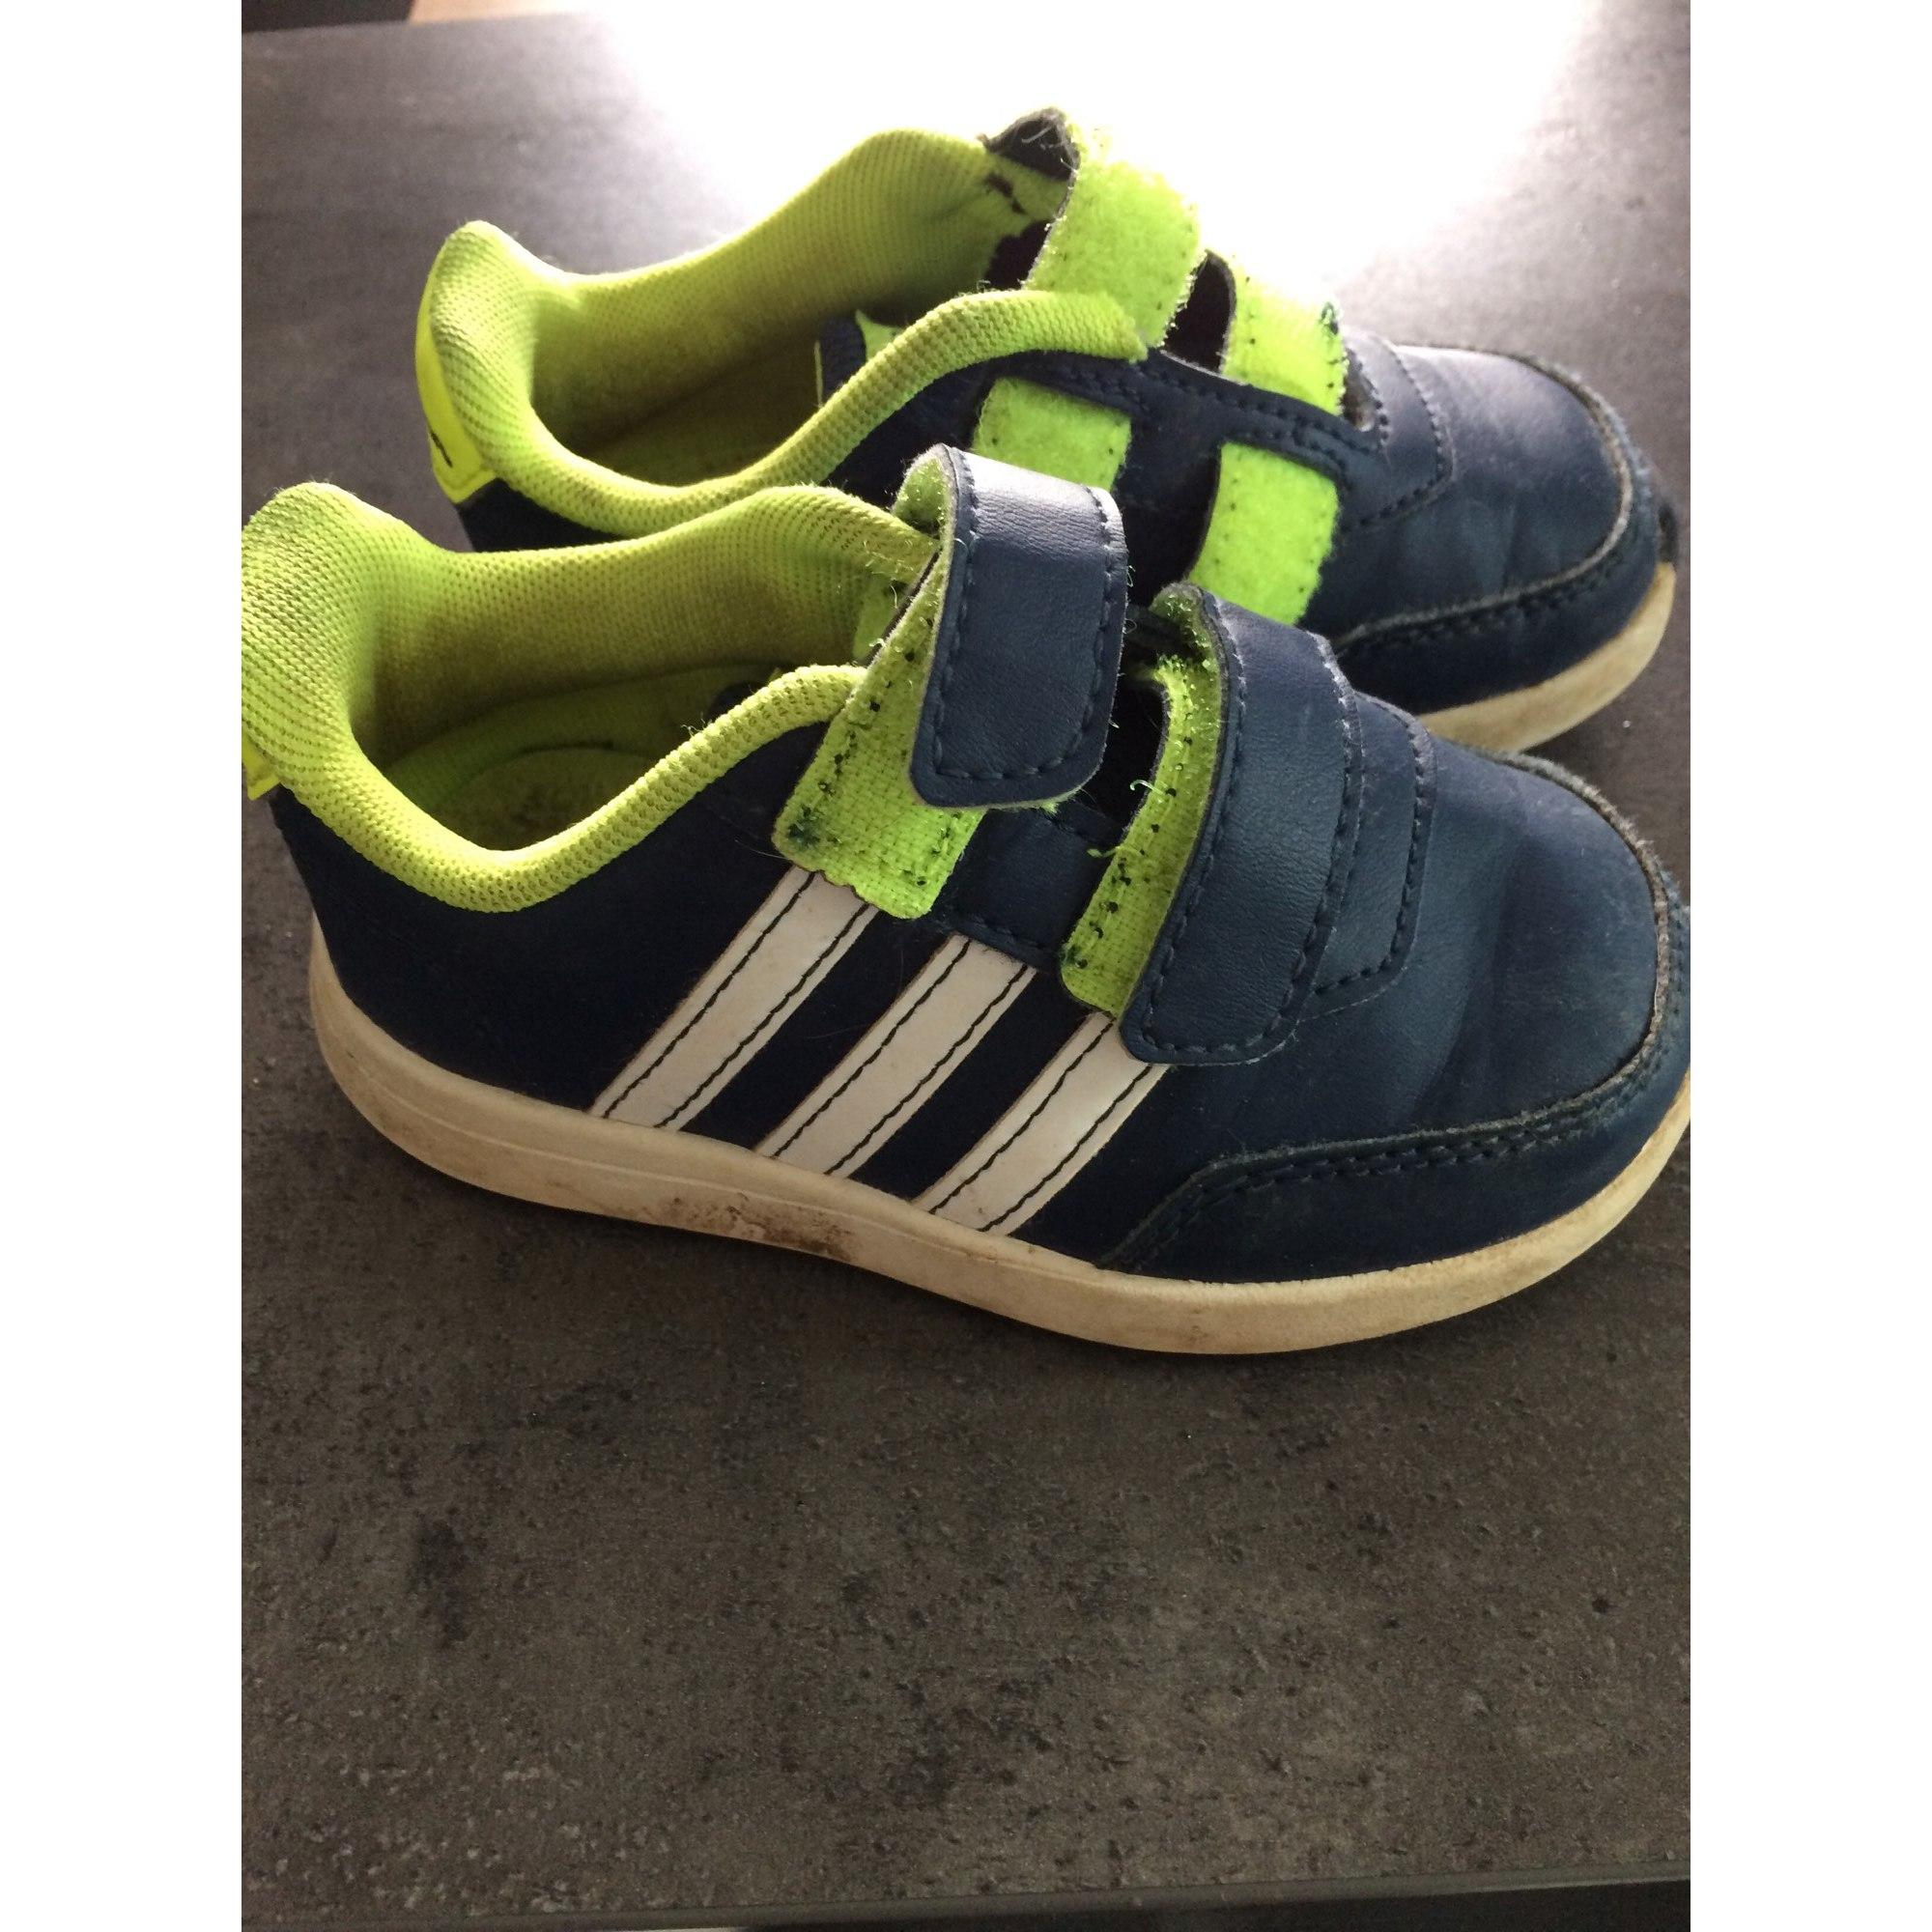 adidas enfant chaussures 23